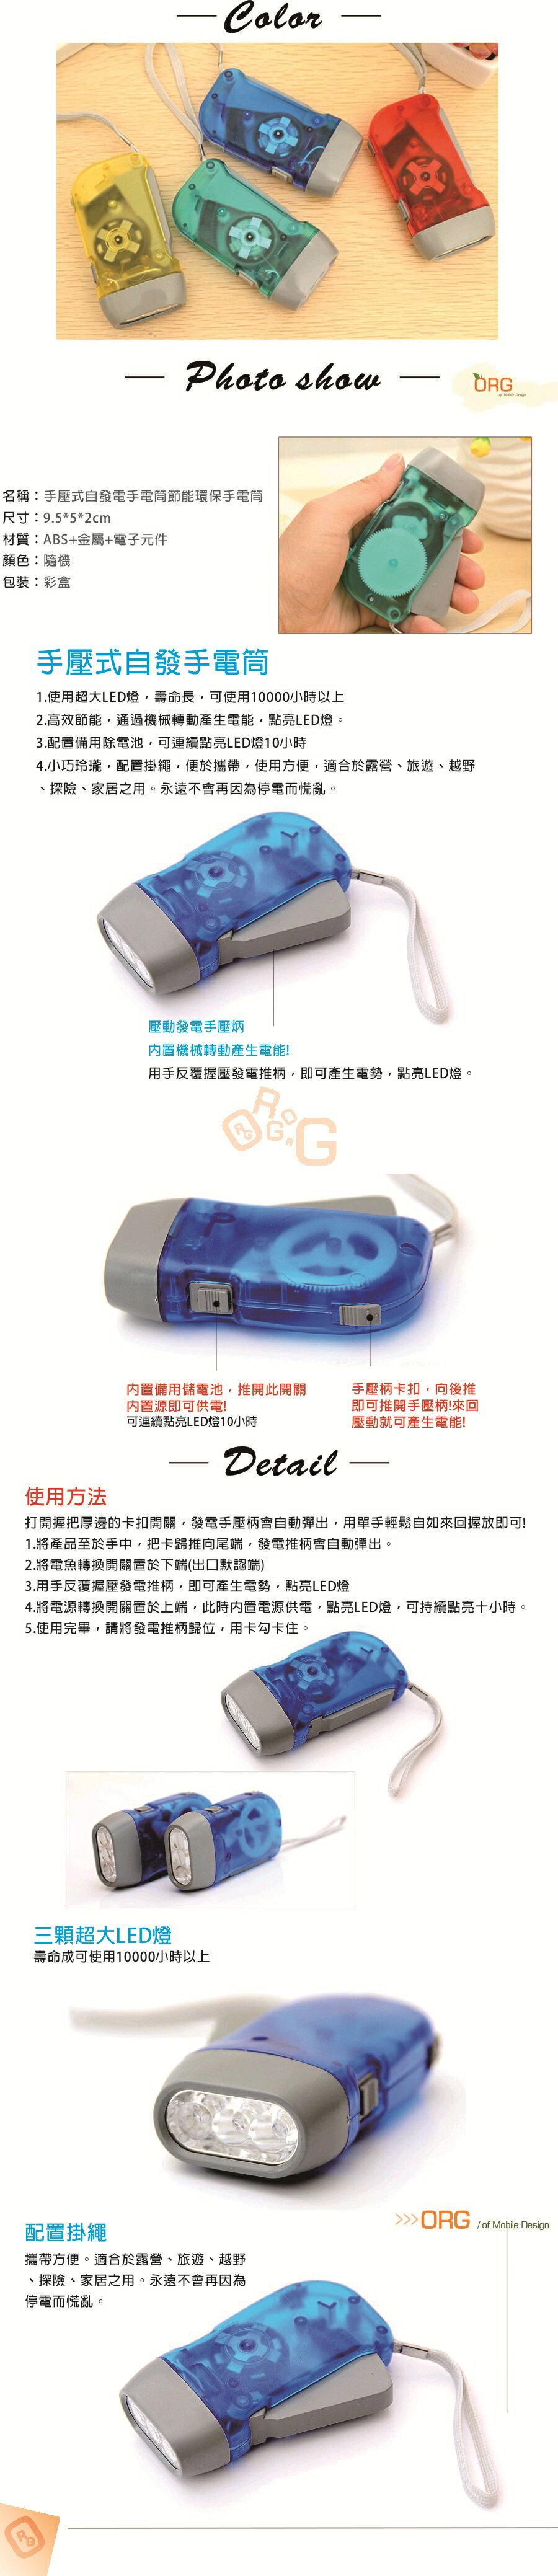 ORG《SD0468》救急~手動 手壓式 手按 手電筒 環保 3顆 LED燈 帶掛繩 地震 / 火災 / 停電 救急用品 1